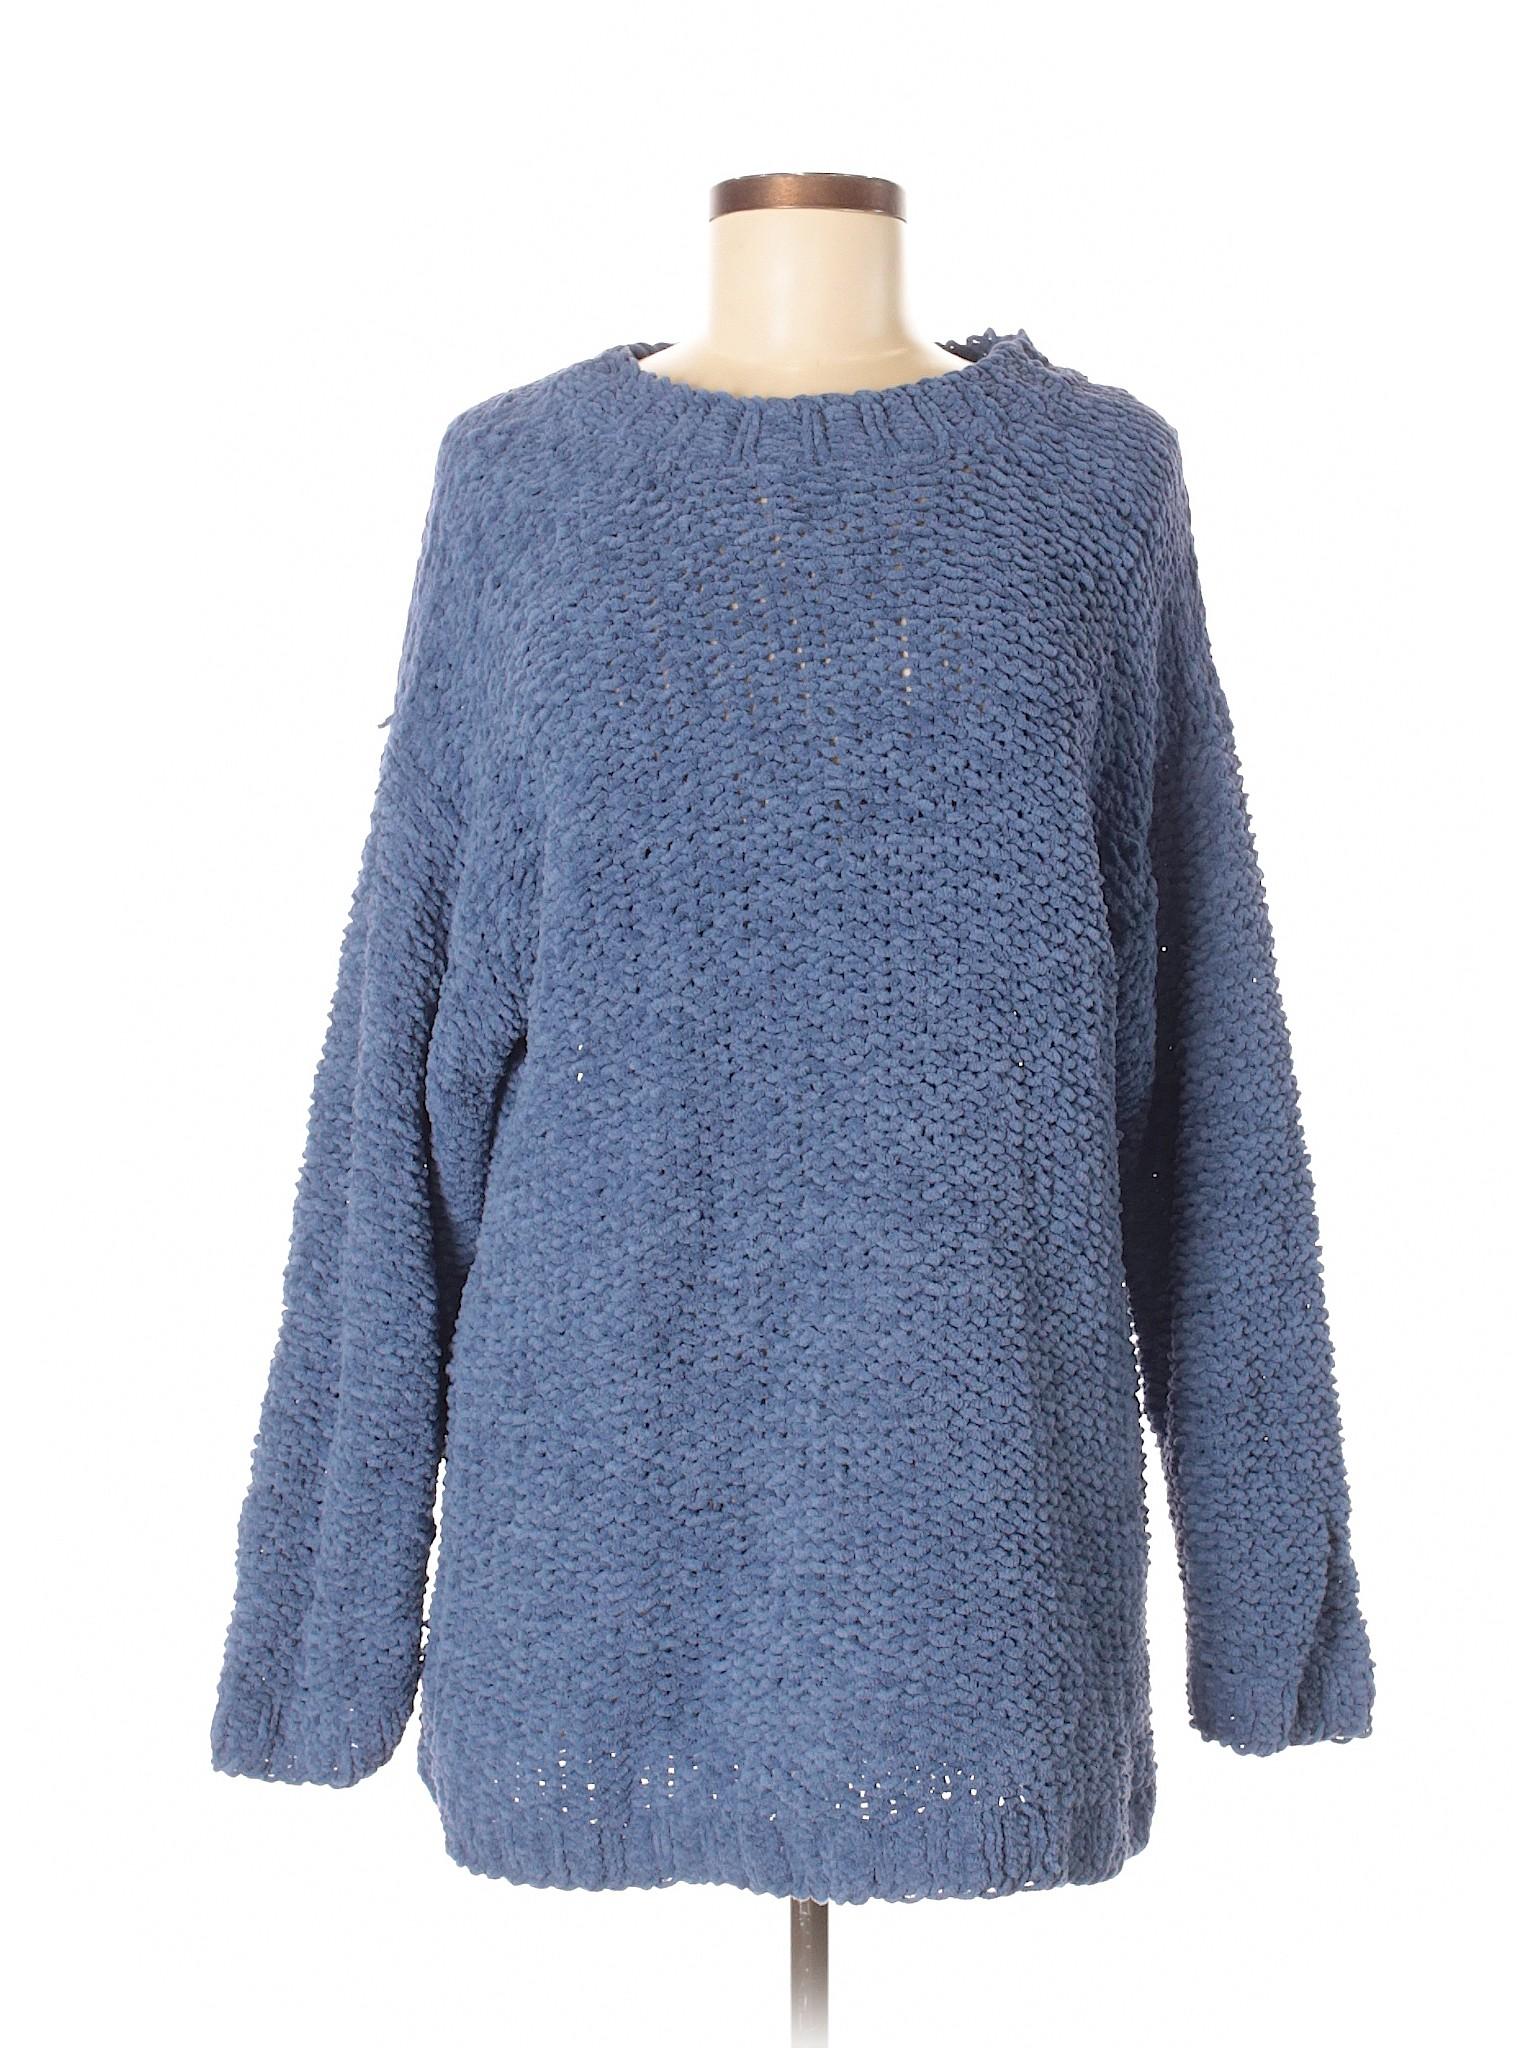 Boutique Zoe Sweater Boutique Pullover Sweater Nic Nic Pullover Zoe Zoe Boutique Nic w6wWOn7rqx